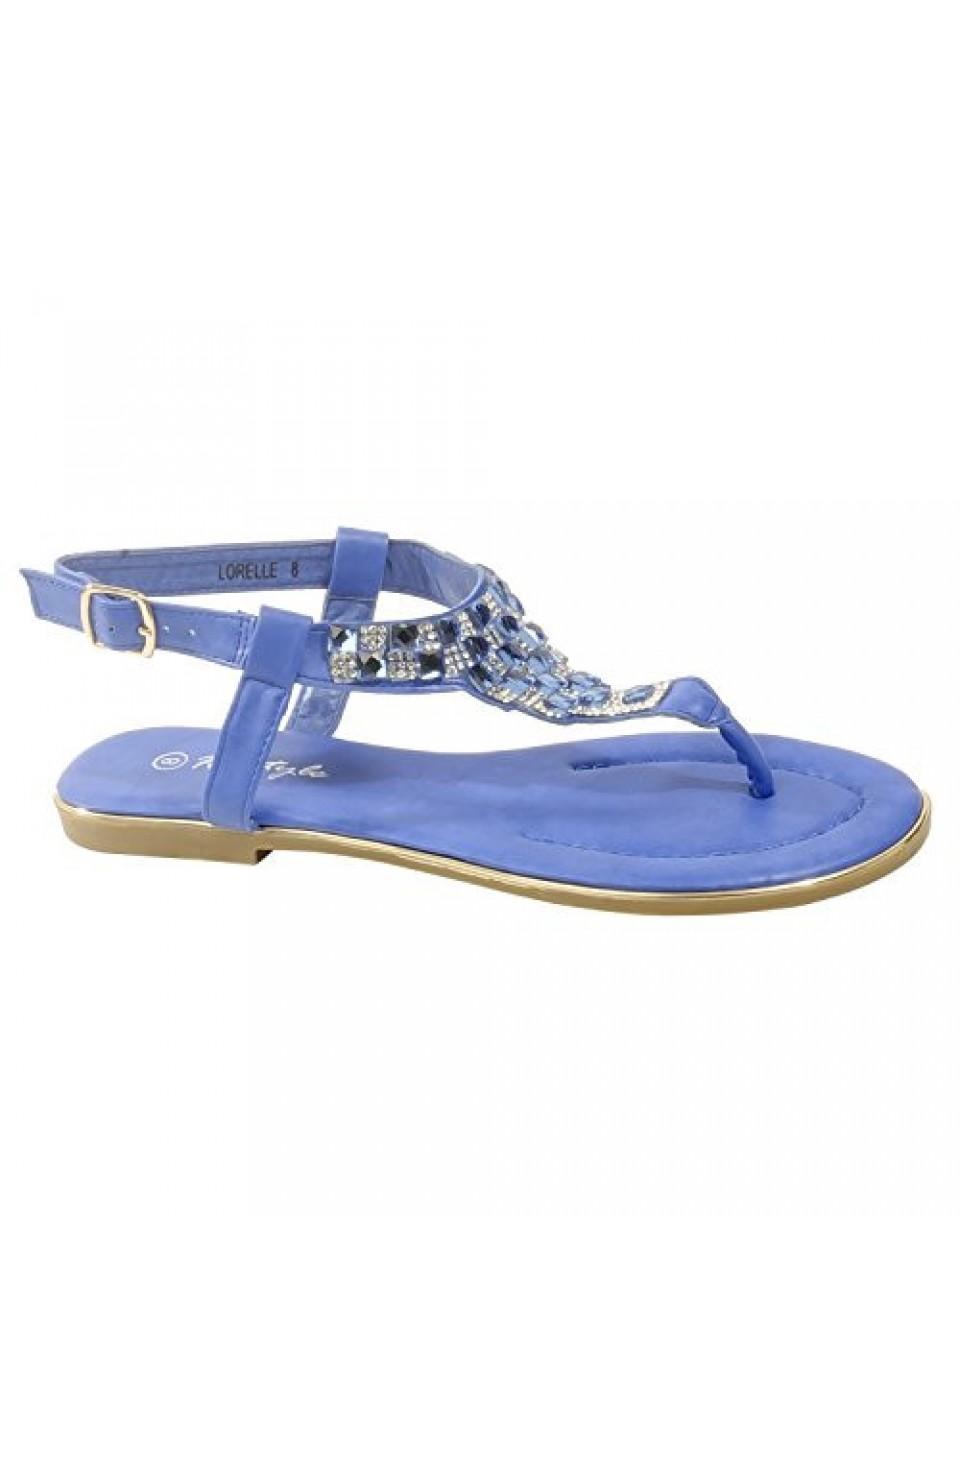 Women's Royal Blue Manmade Lorelle Thong Sandal with Patterned Jewel Vamp